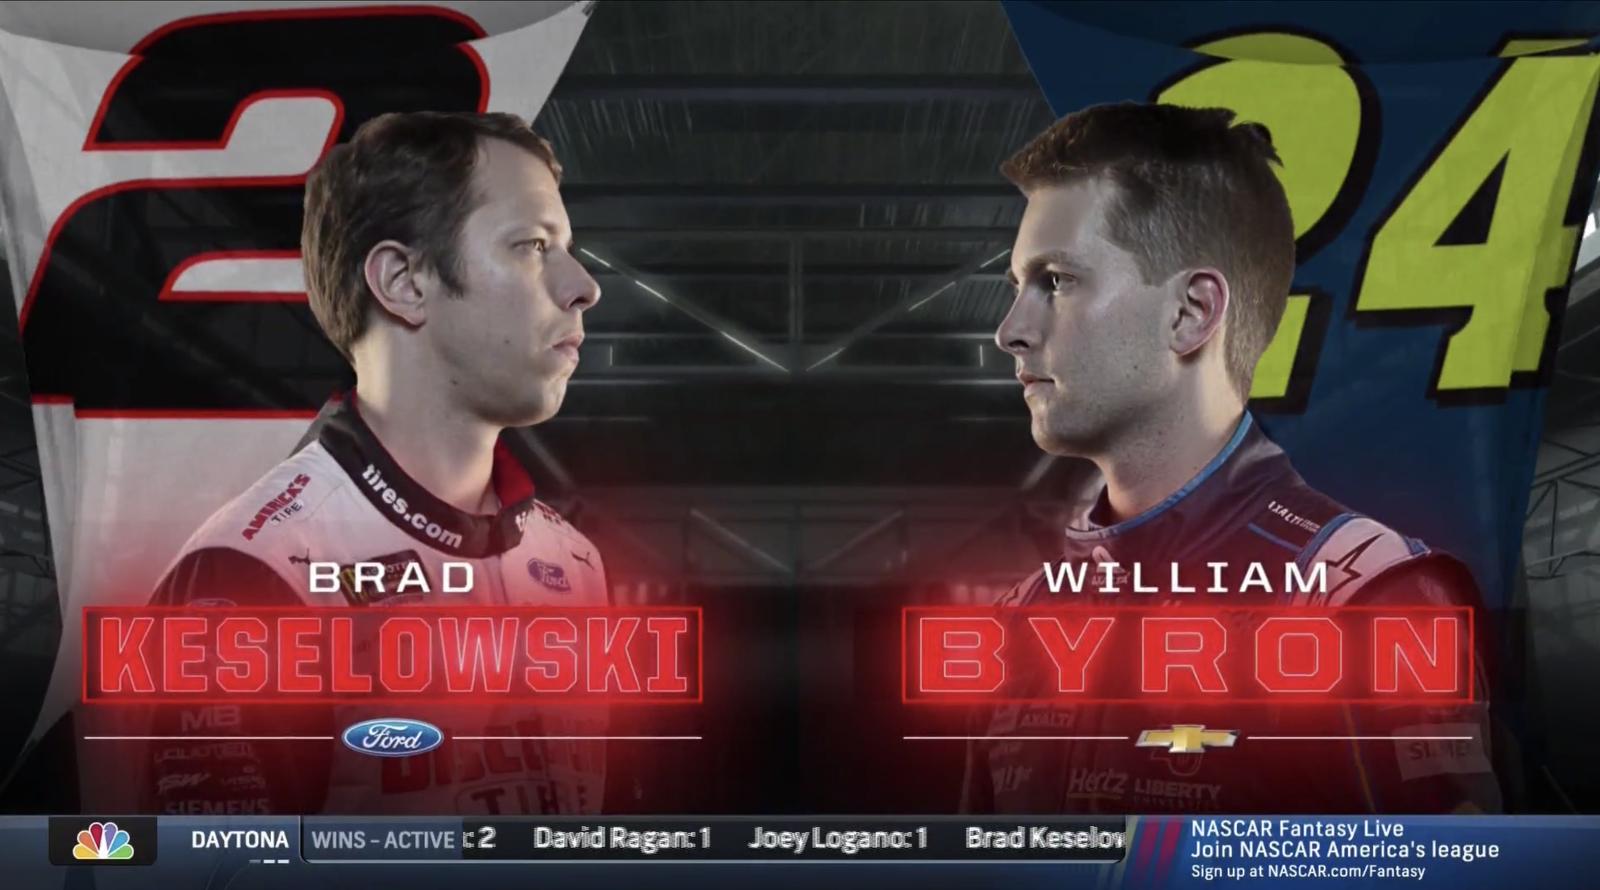 NCS_NBC-Sports_NASCAR-Design_0012